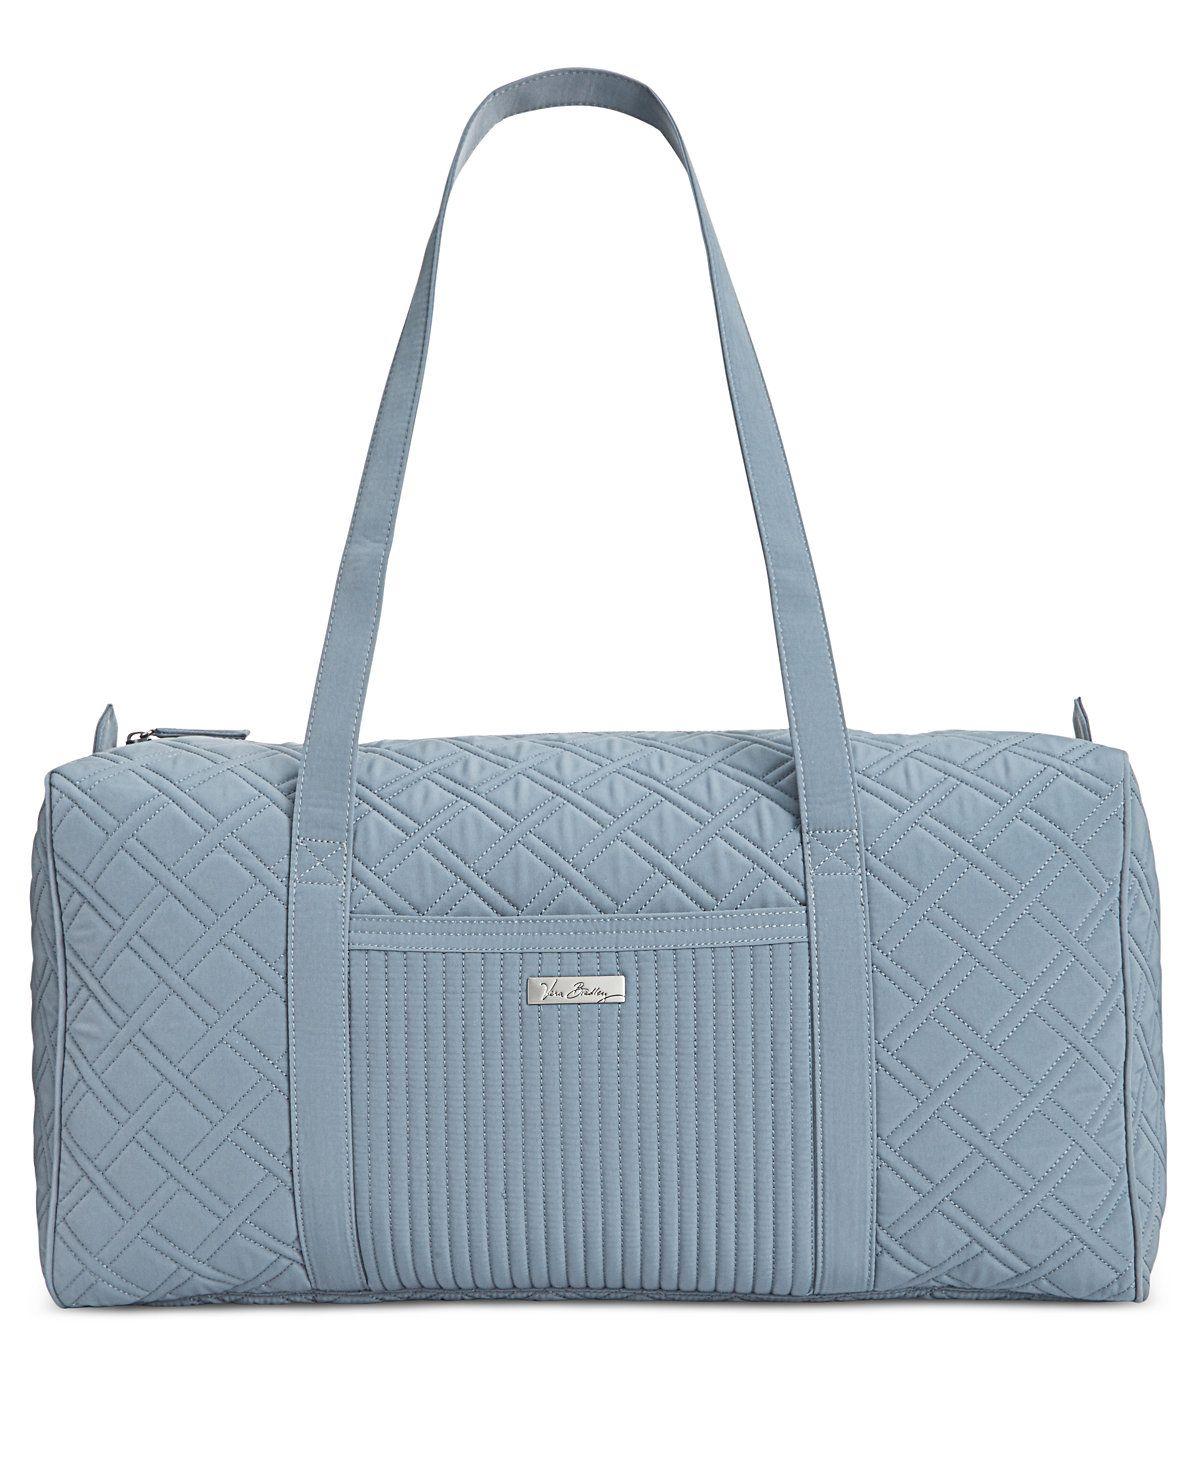 51e2b8685014 Vera Bradley Large Duffle Bag - Handbags   Accessories - Macy s ...